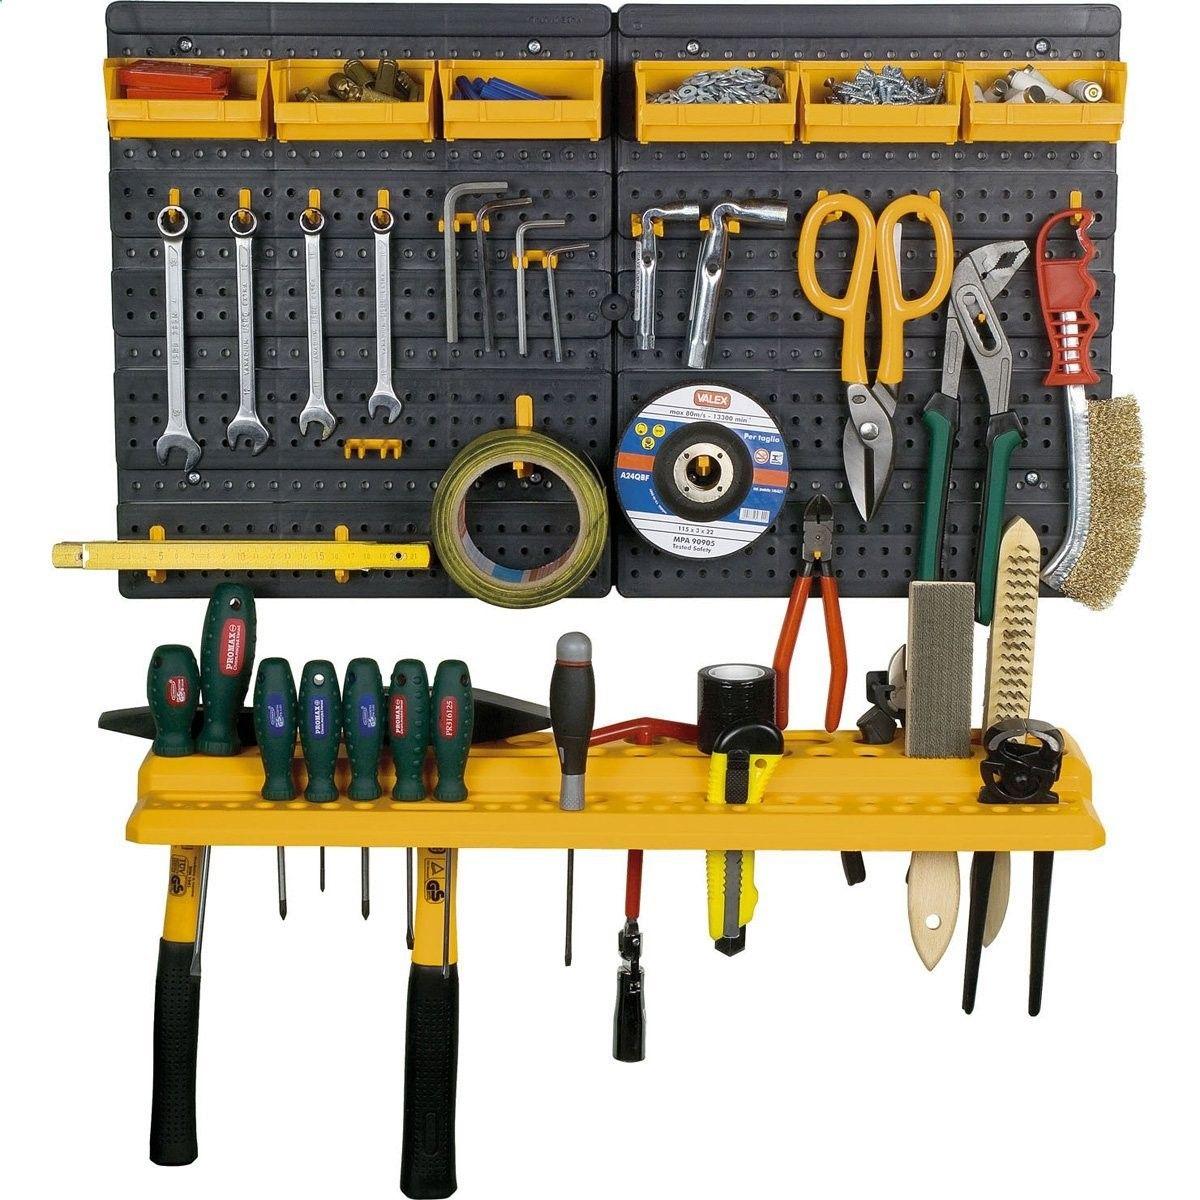 Garage Tool Rack Wall Kit Mini Storage Tools Organizer Home 19 Hooks 6 Bins